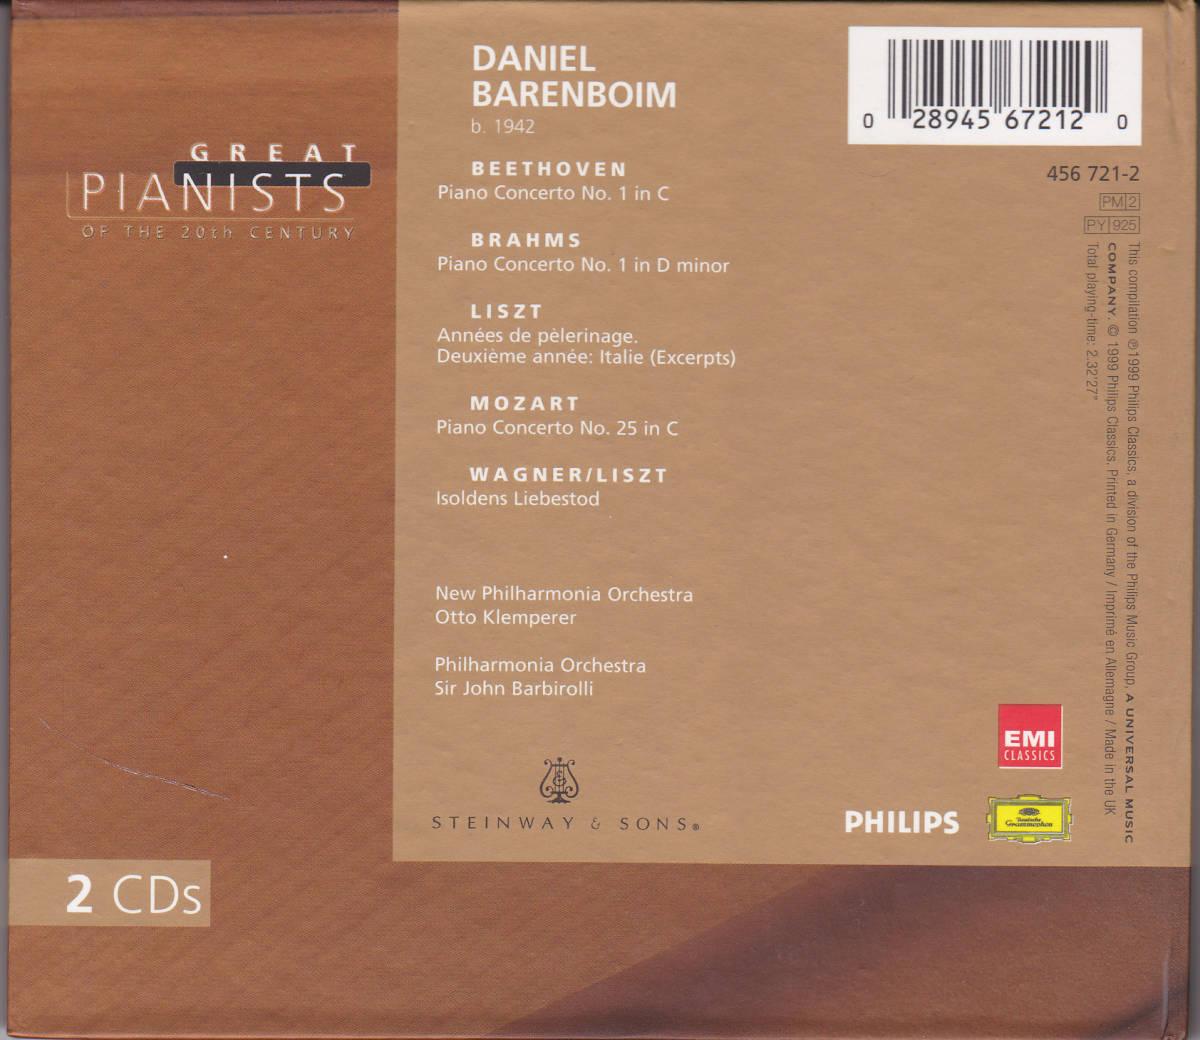 Daniel Barenboim / Great Pianists of the 20th Century 2CD_画像2